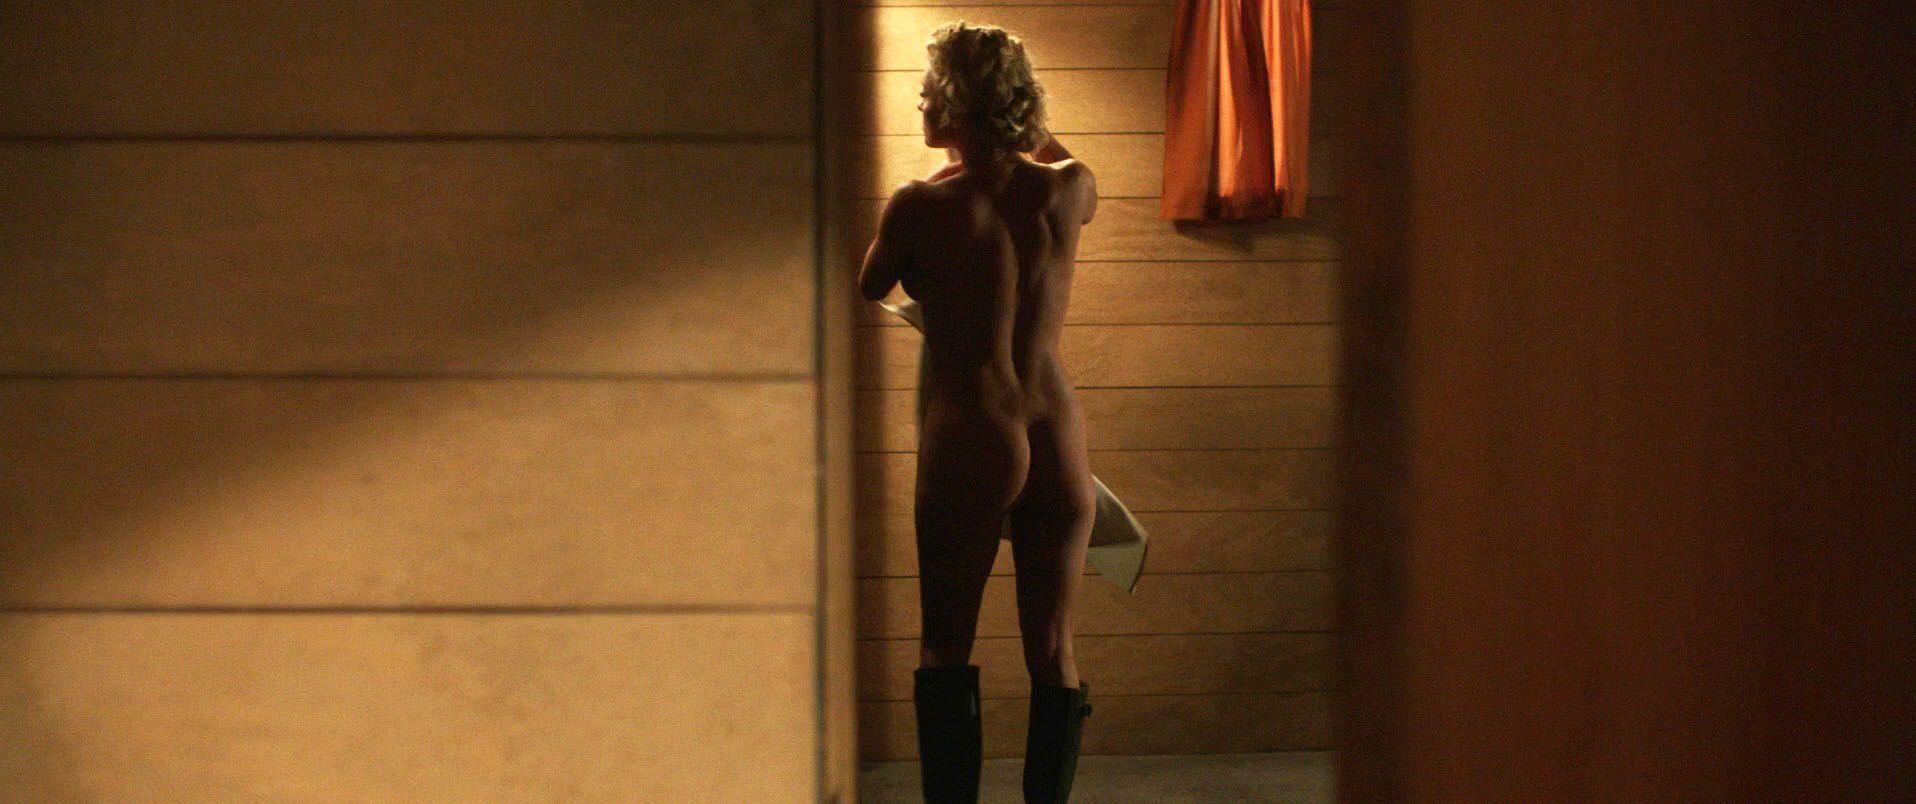 Pamela Anderson Nude 5 Sn6523